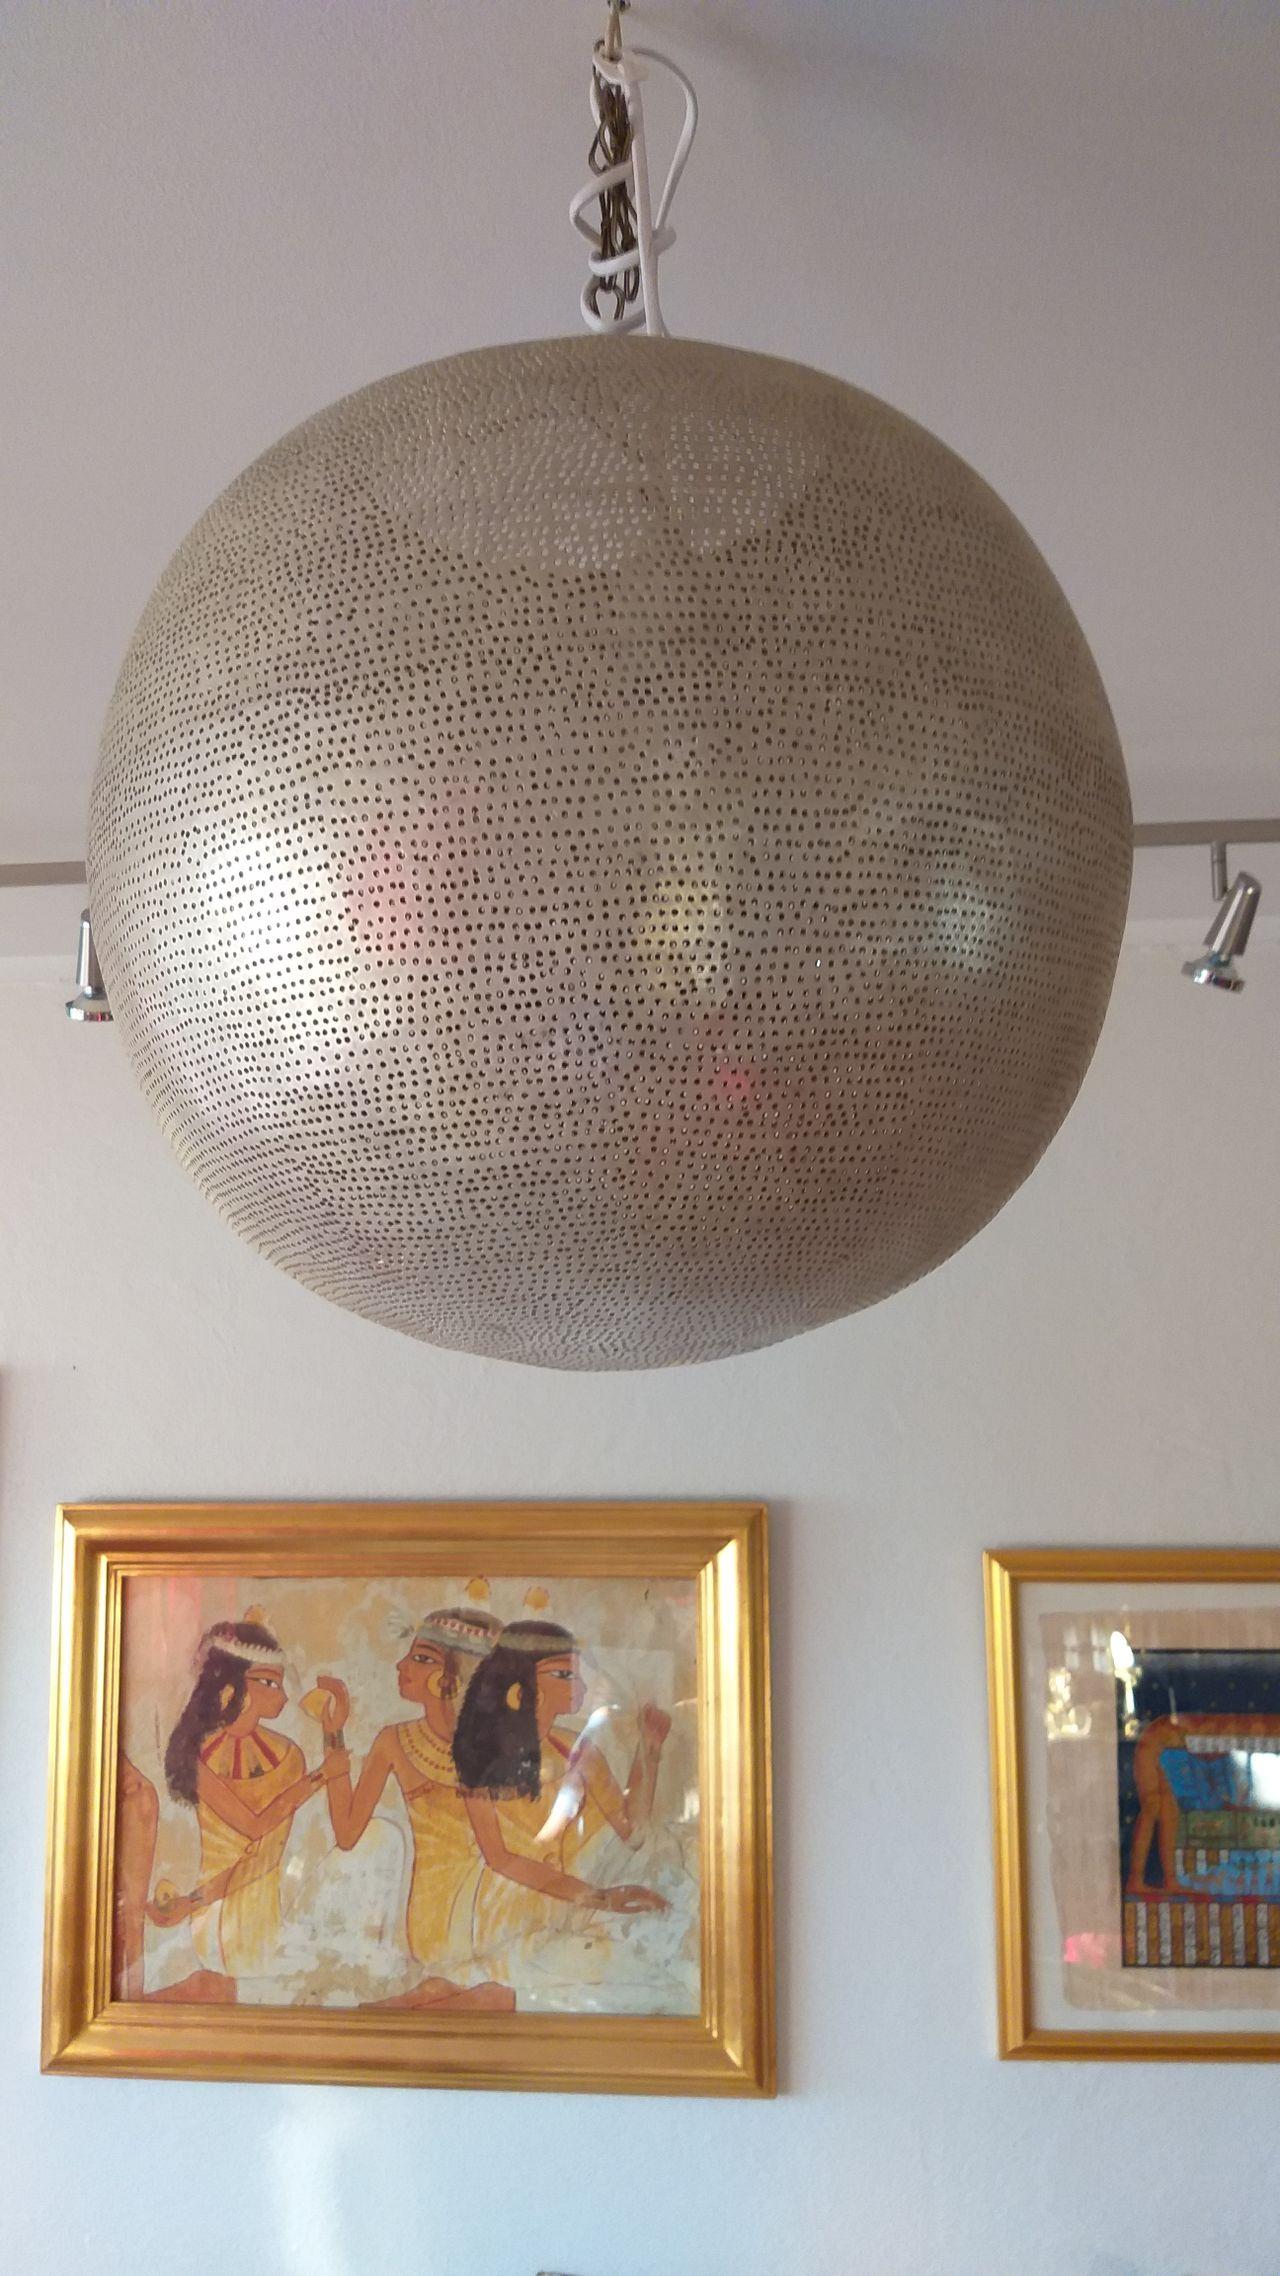 Orientalske lamper 3 stk og dekorative bokser i tre   FINN.no